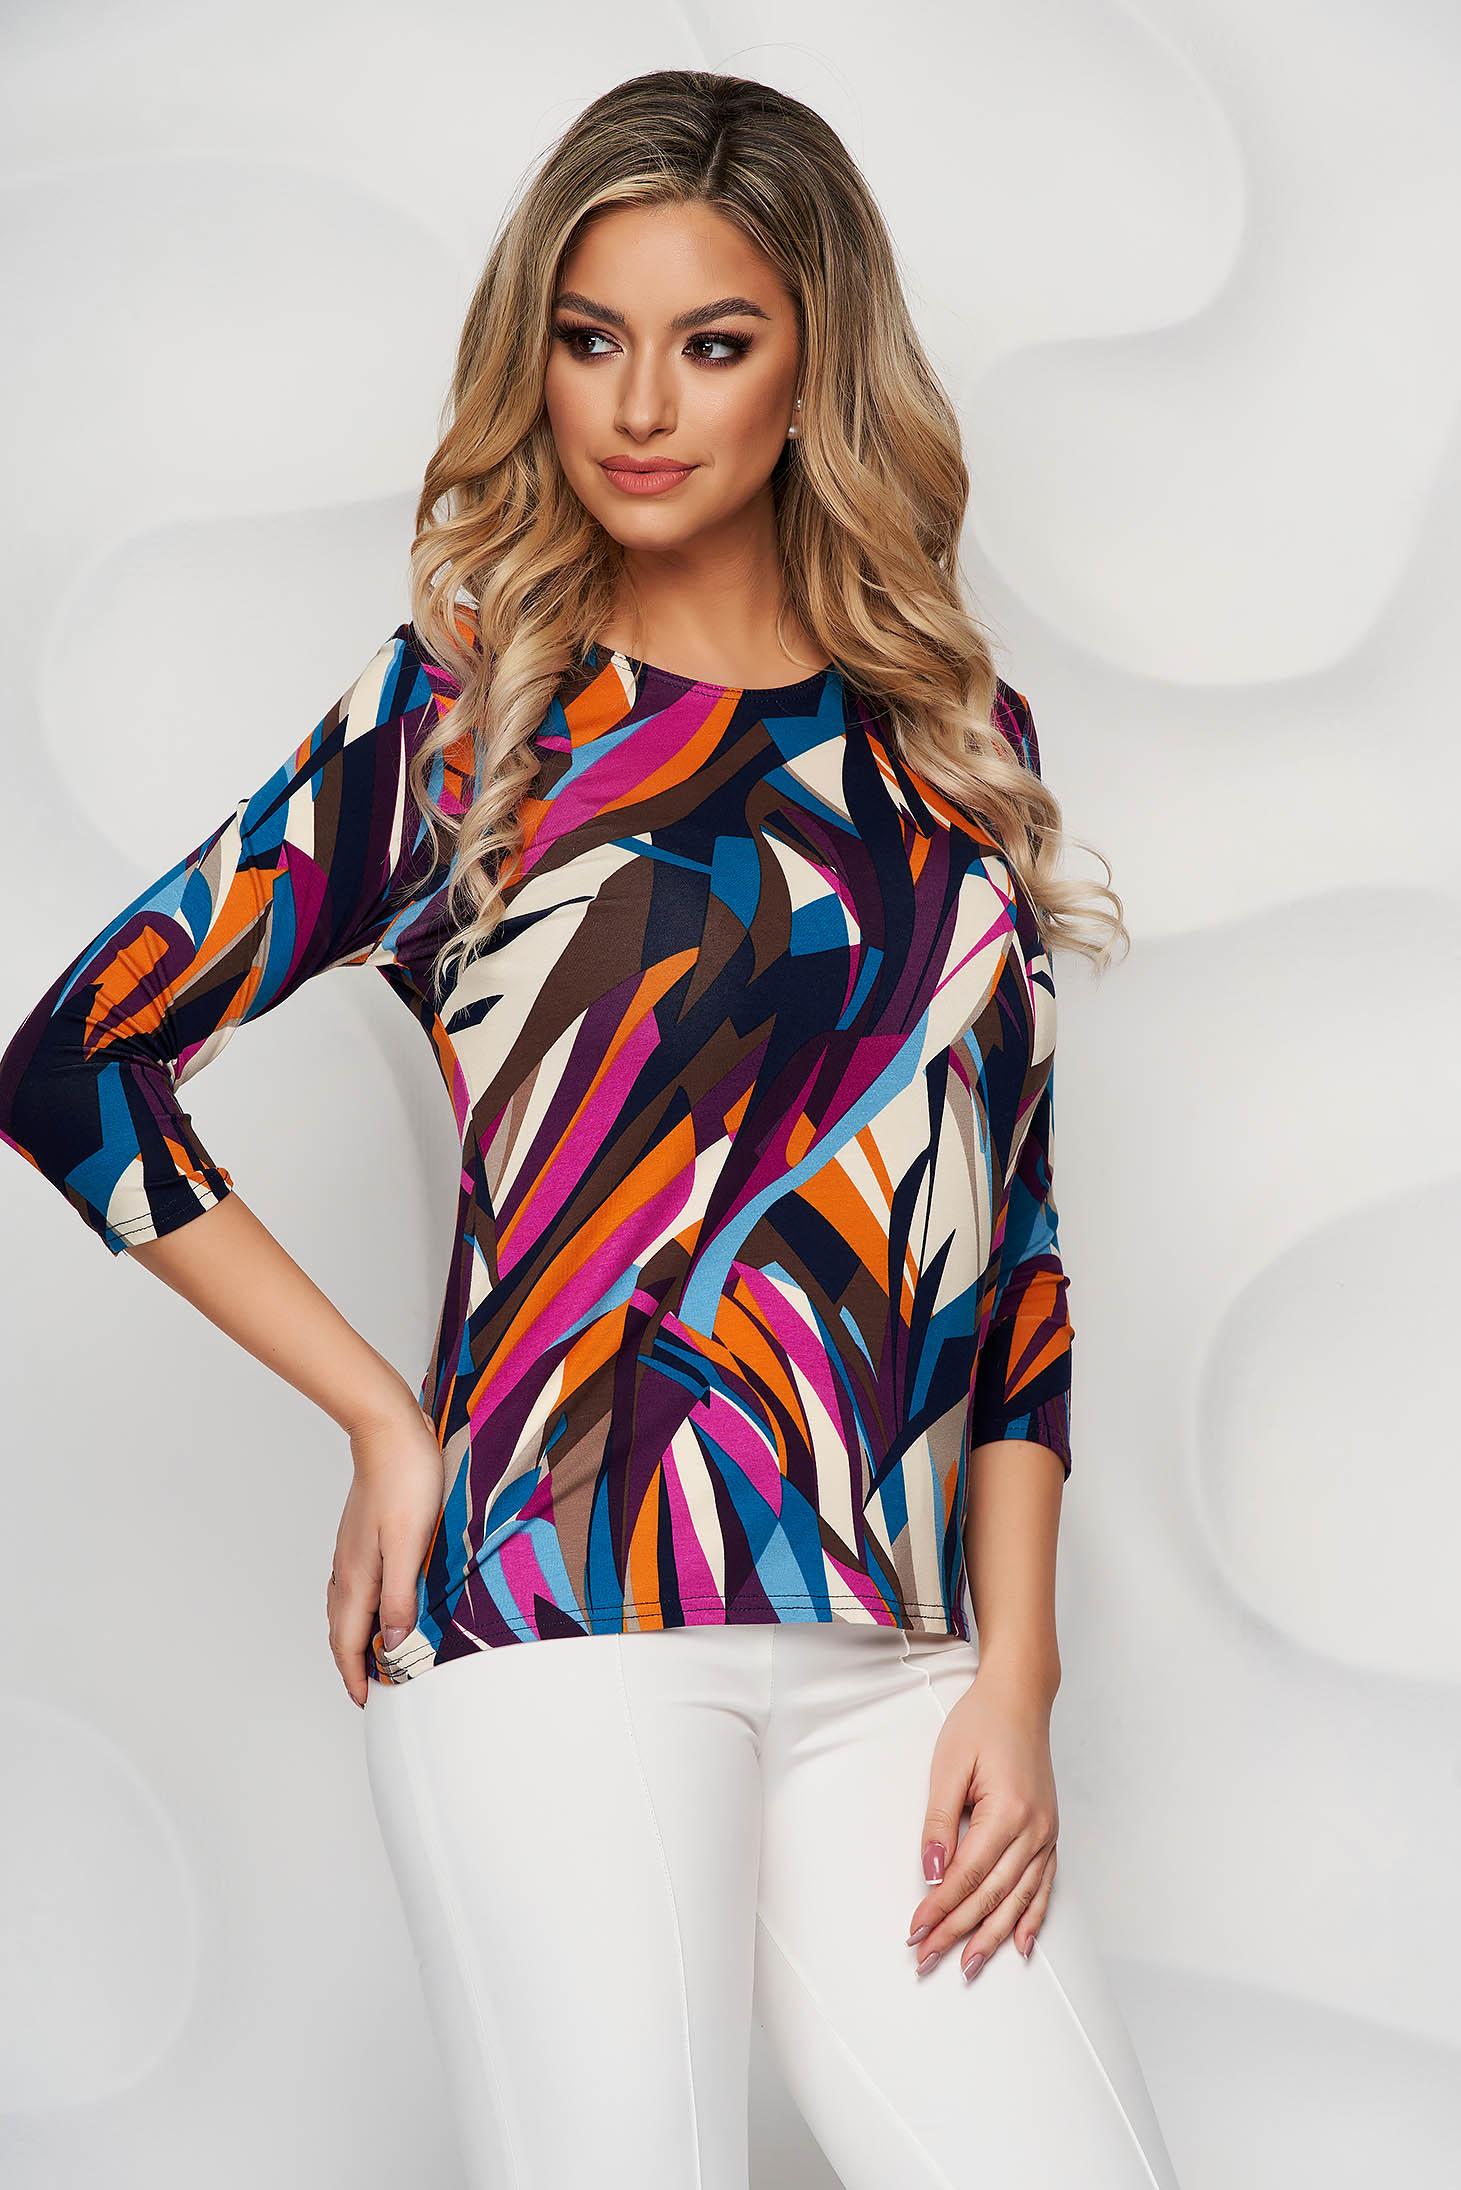 Bluza dama Lady Pandora cu imprimeuri grafice din material elastic si fin cu croi larg